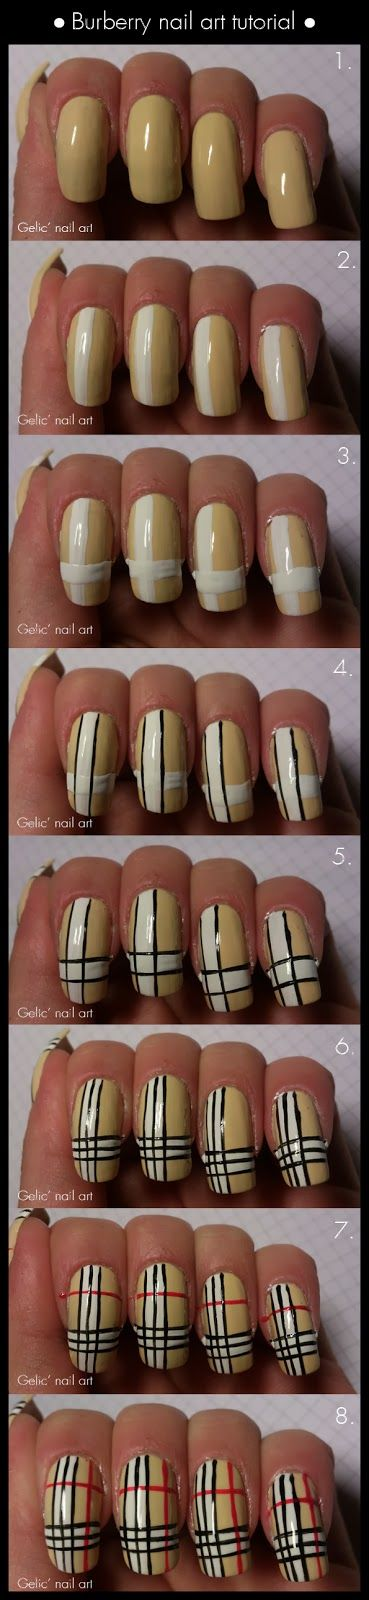 Gelic' nail art: Burberry nail art tutorial